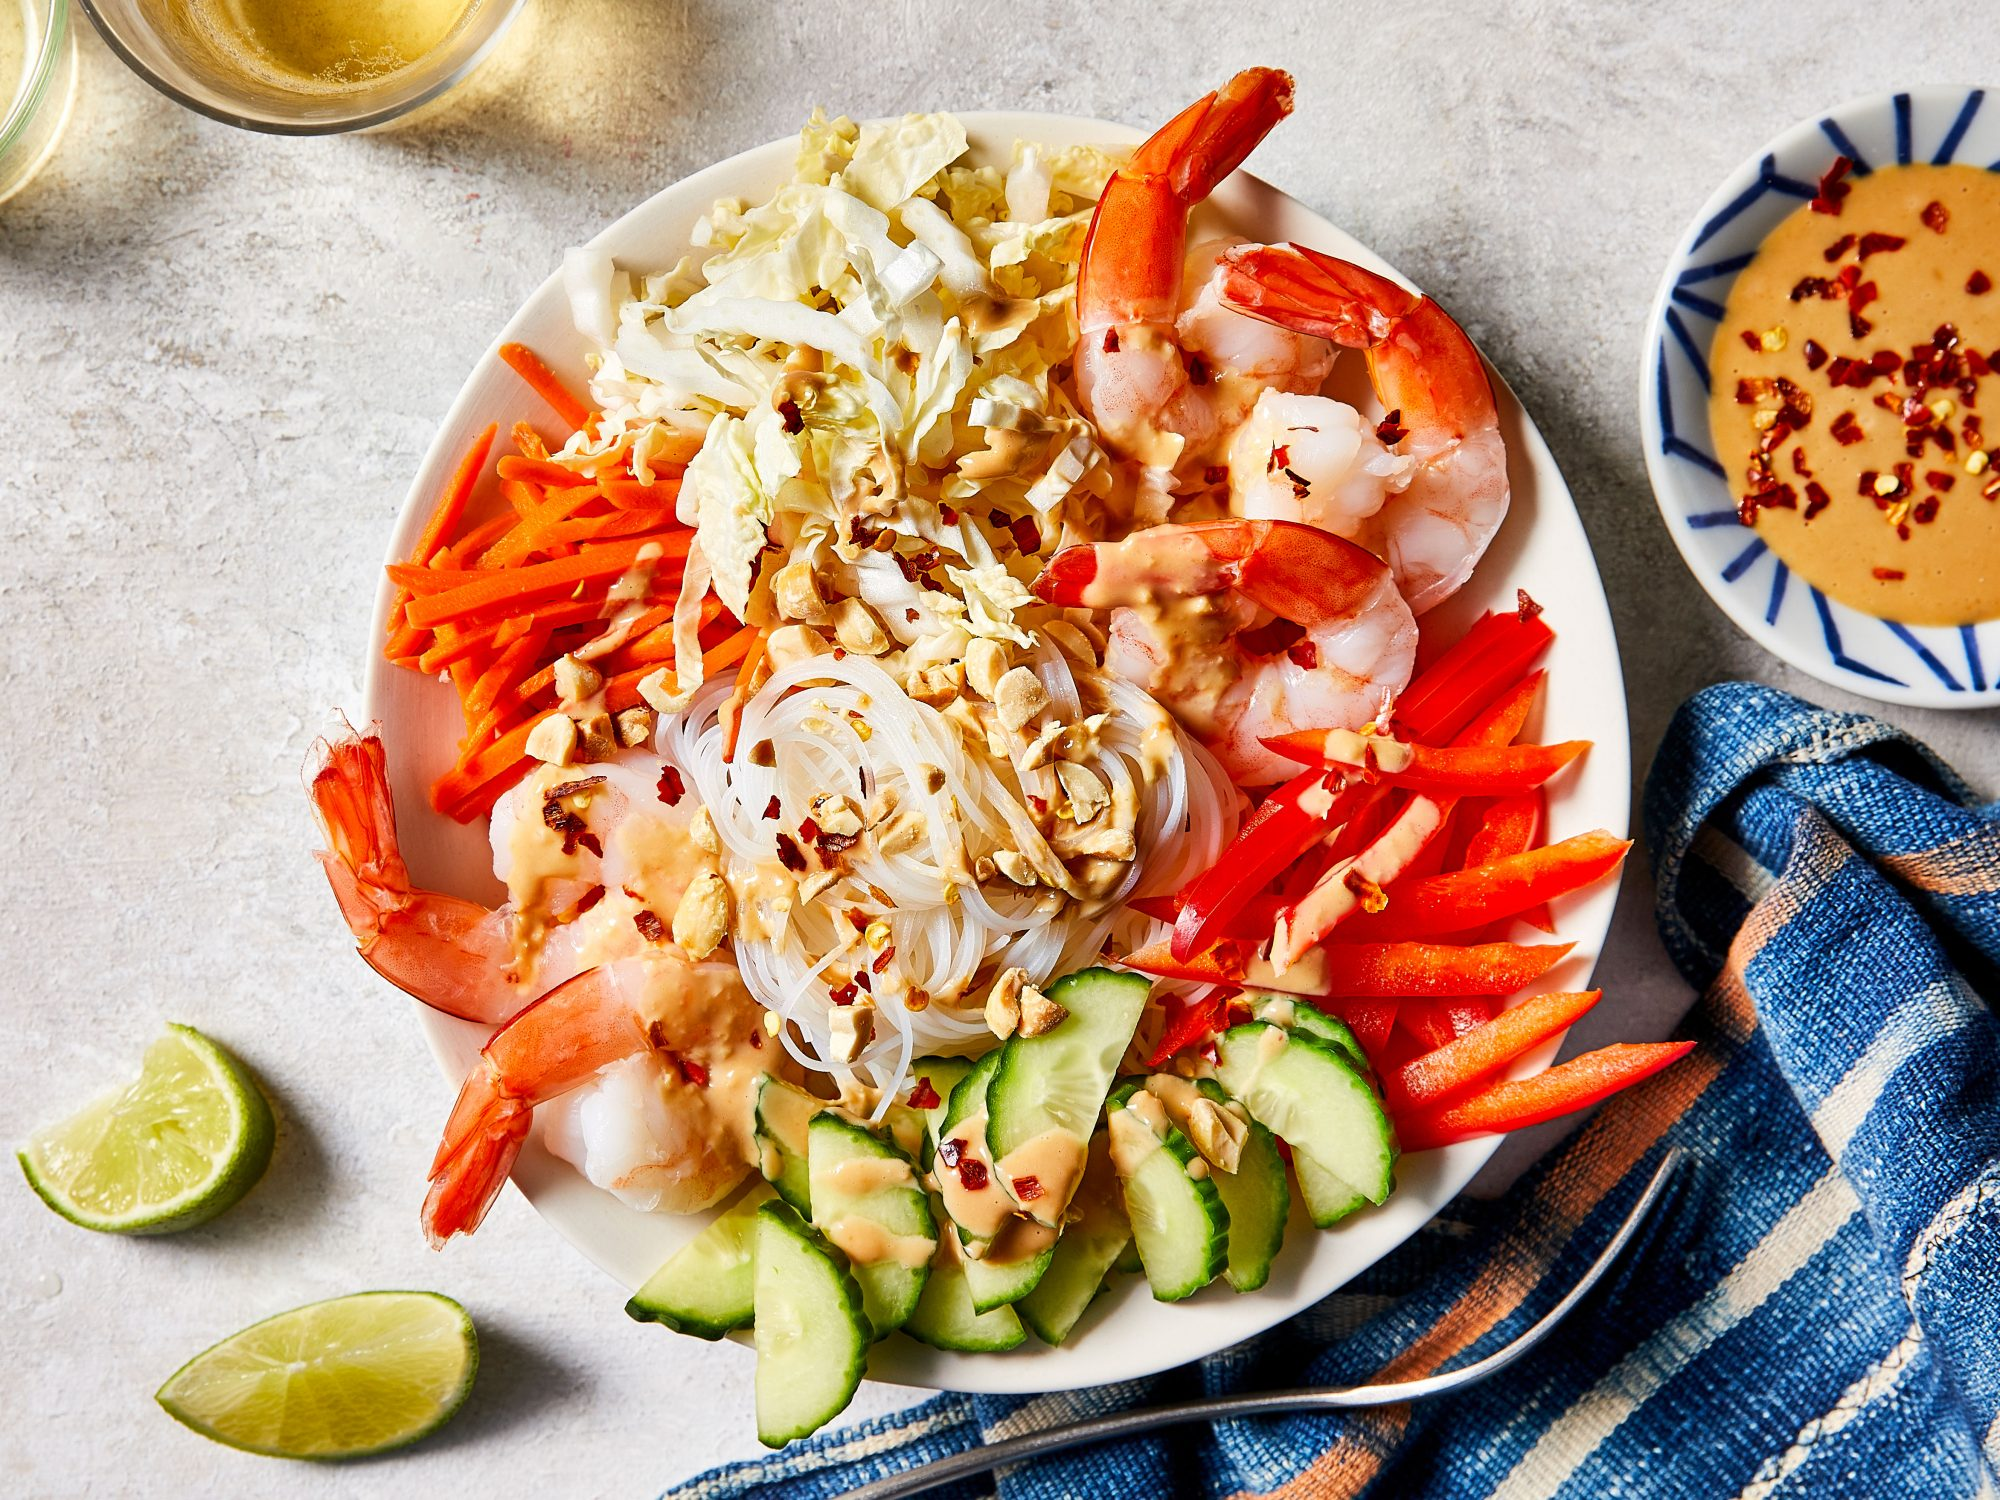 mr- Cool-Down Shrimp Noodle Bowl with Peanut-Ginger Sauce